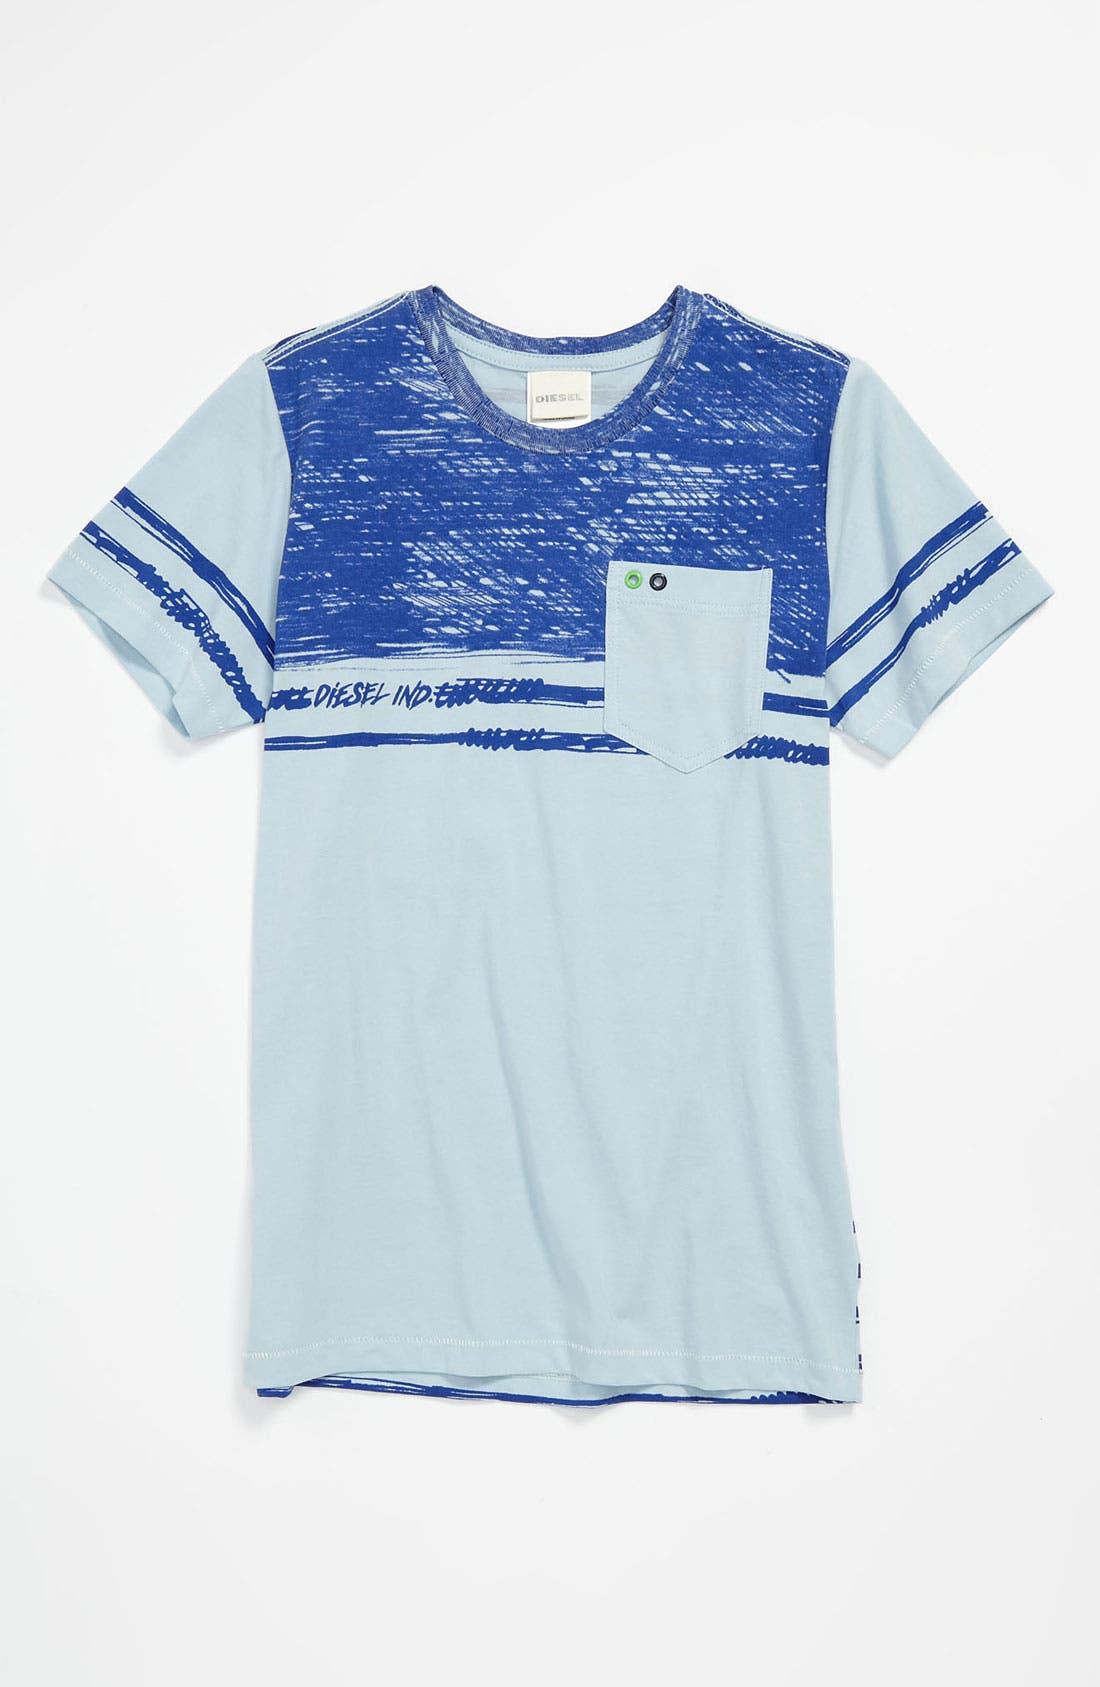 Alternate Image 1 Selected - DIESEL® 'Tailo' T-Shirt (Big Boys)